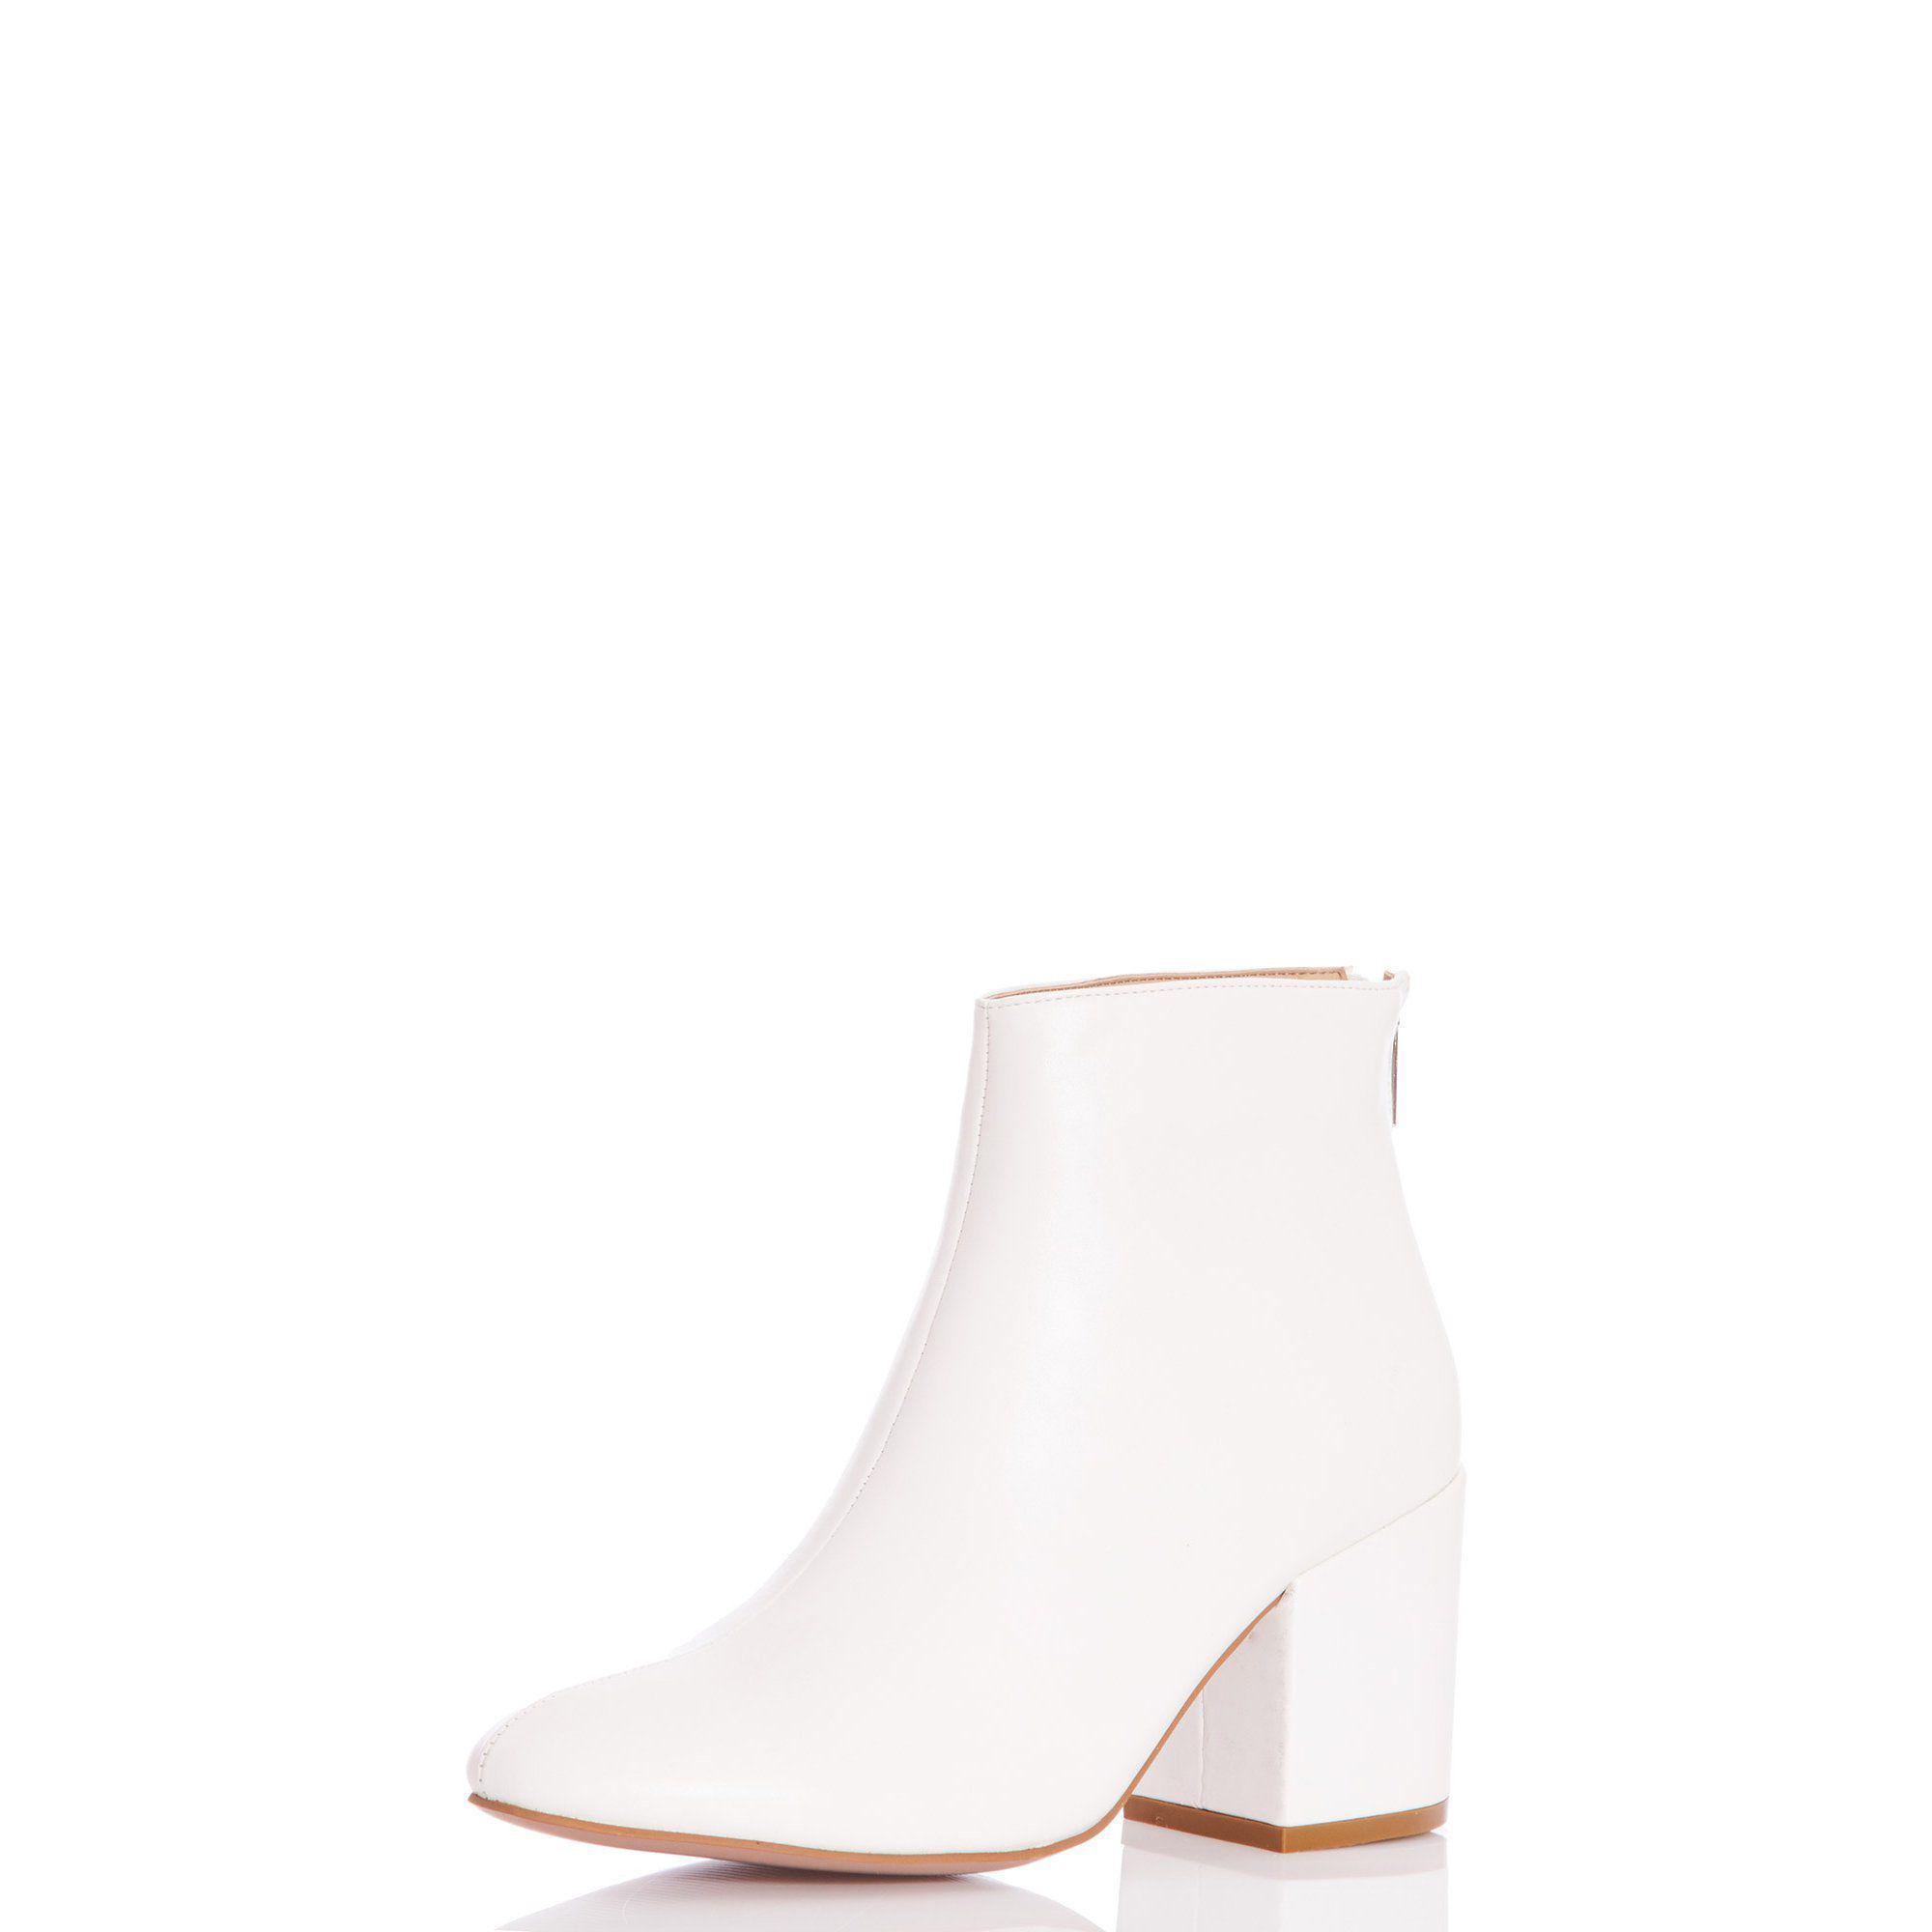 Quiz White Block Heel Ankle Boots - Lyst